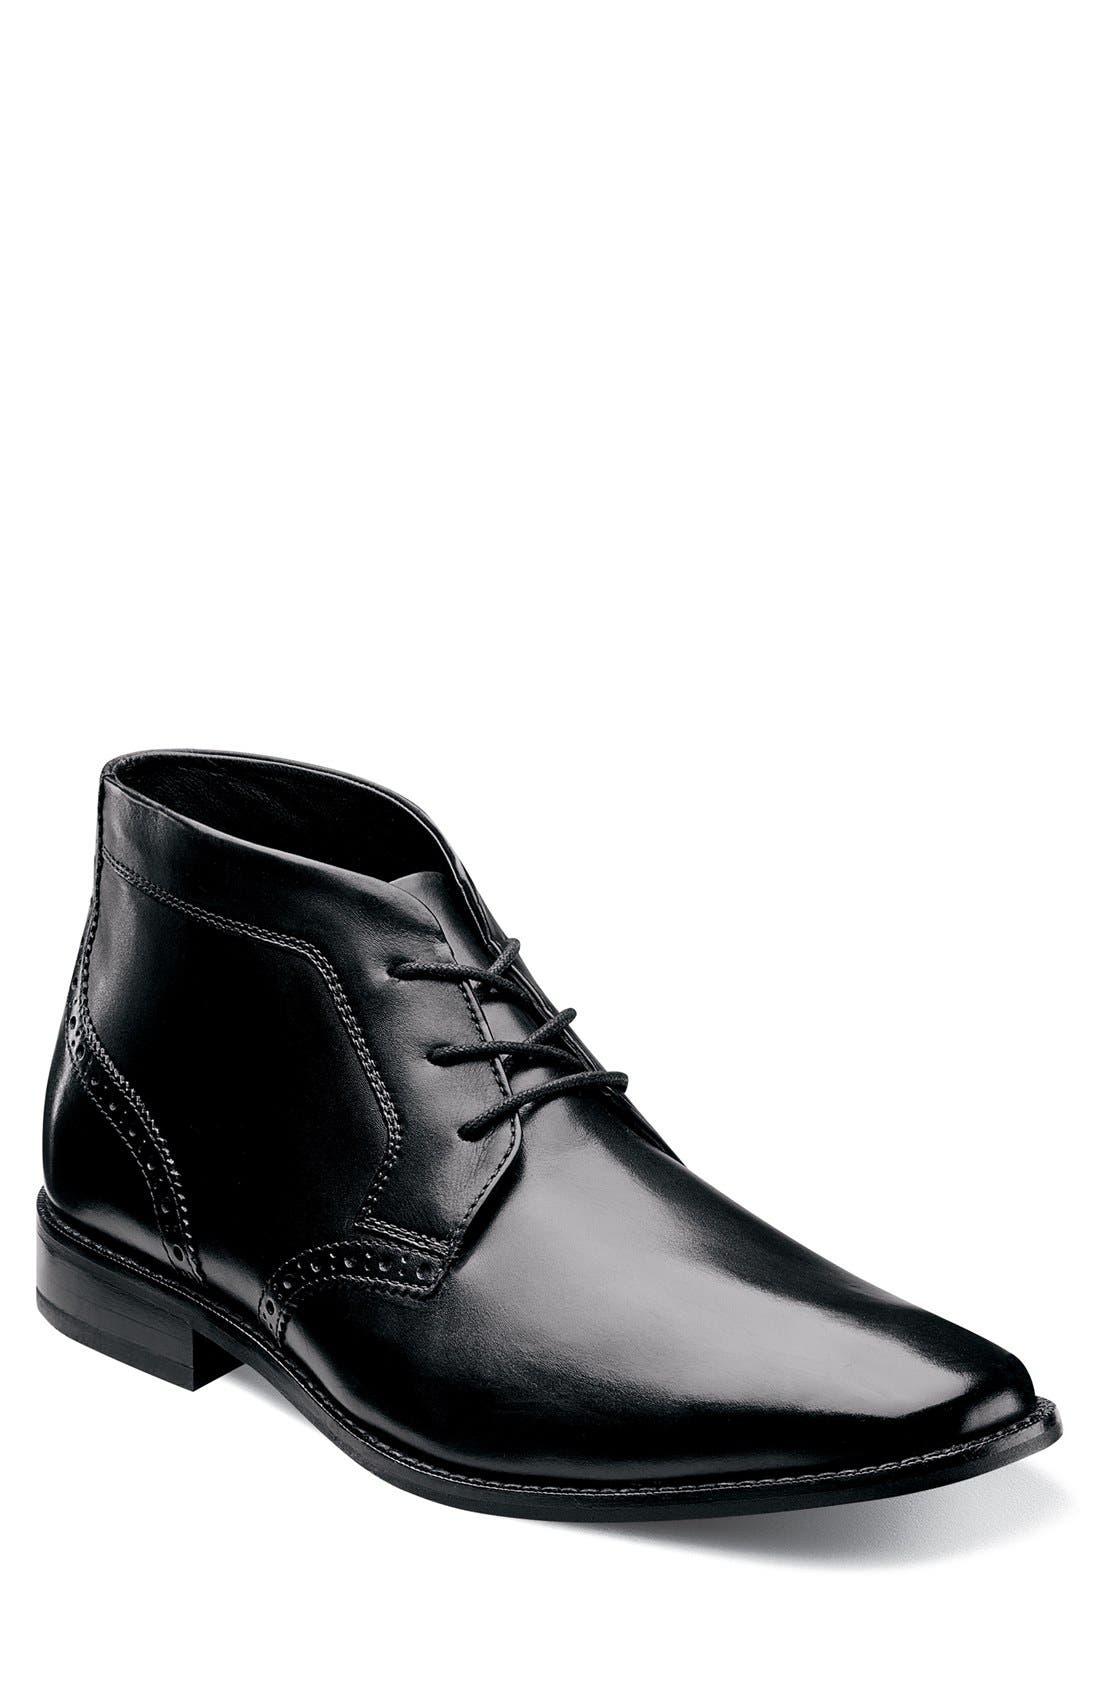 'Castellano' Chukka Boot,                         Main,                         color, 001